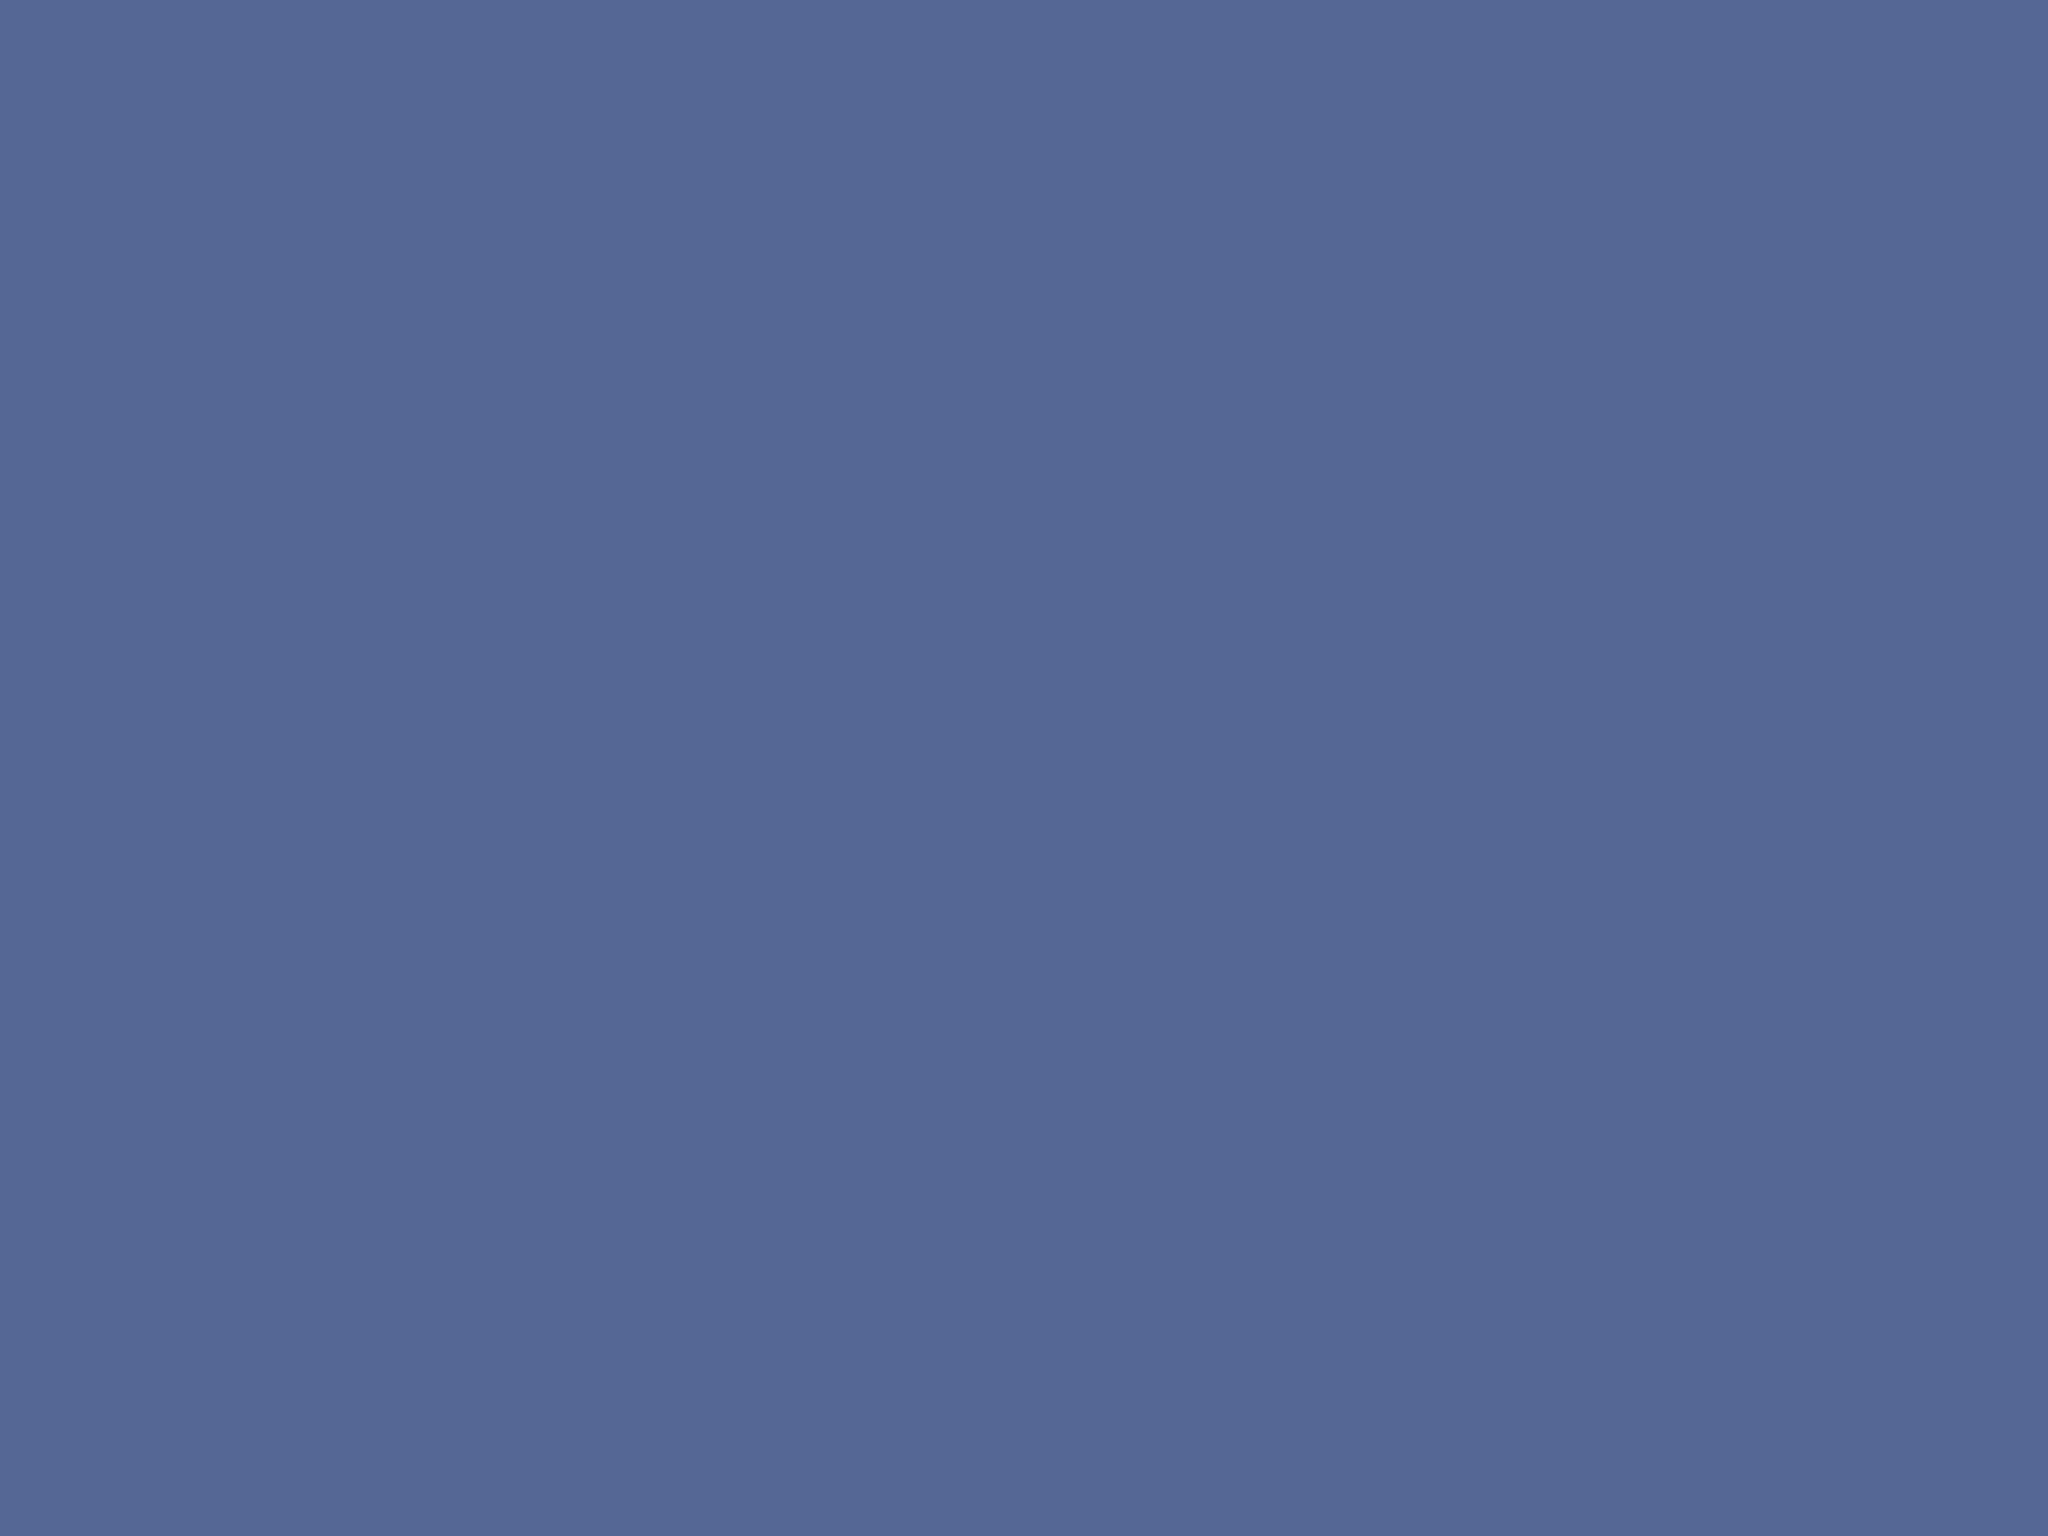 2048x1536 UCLA Blue Solid Color Background